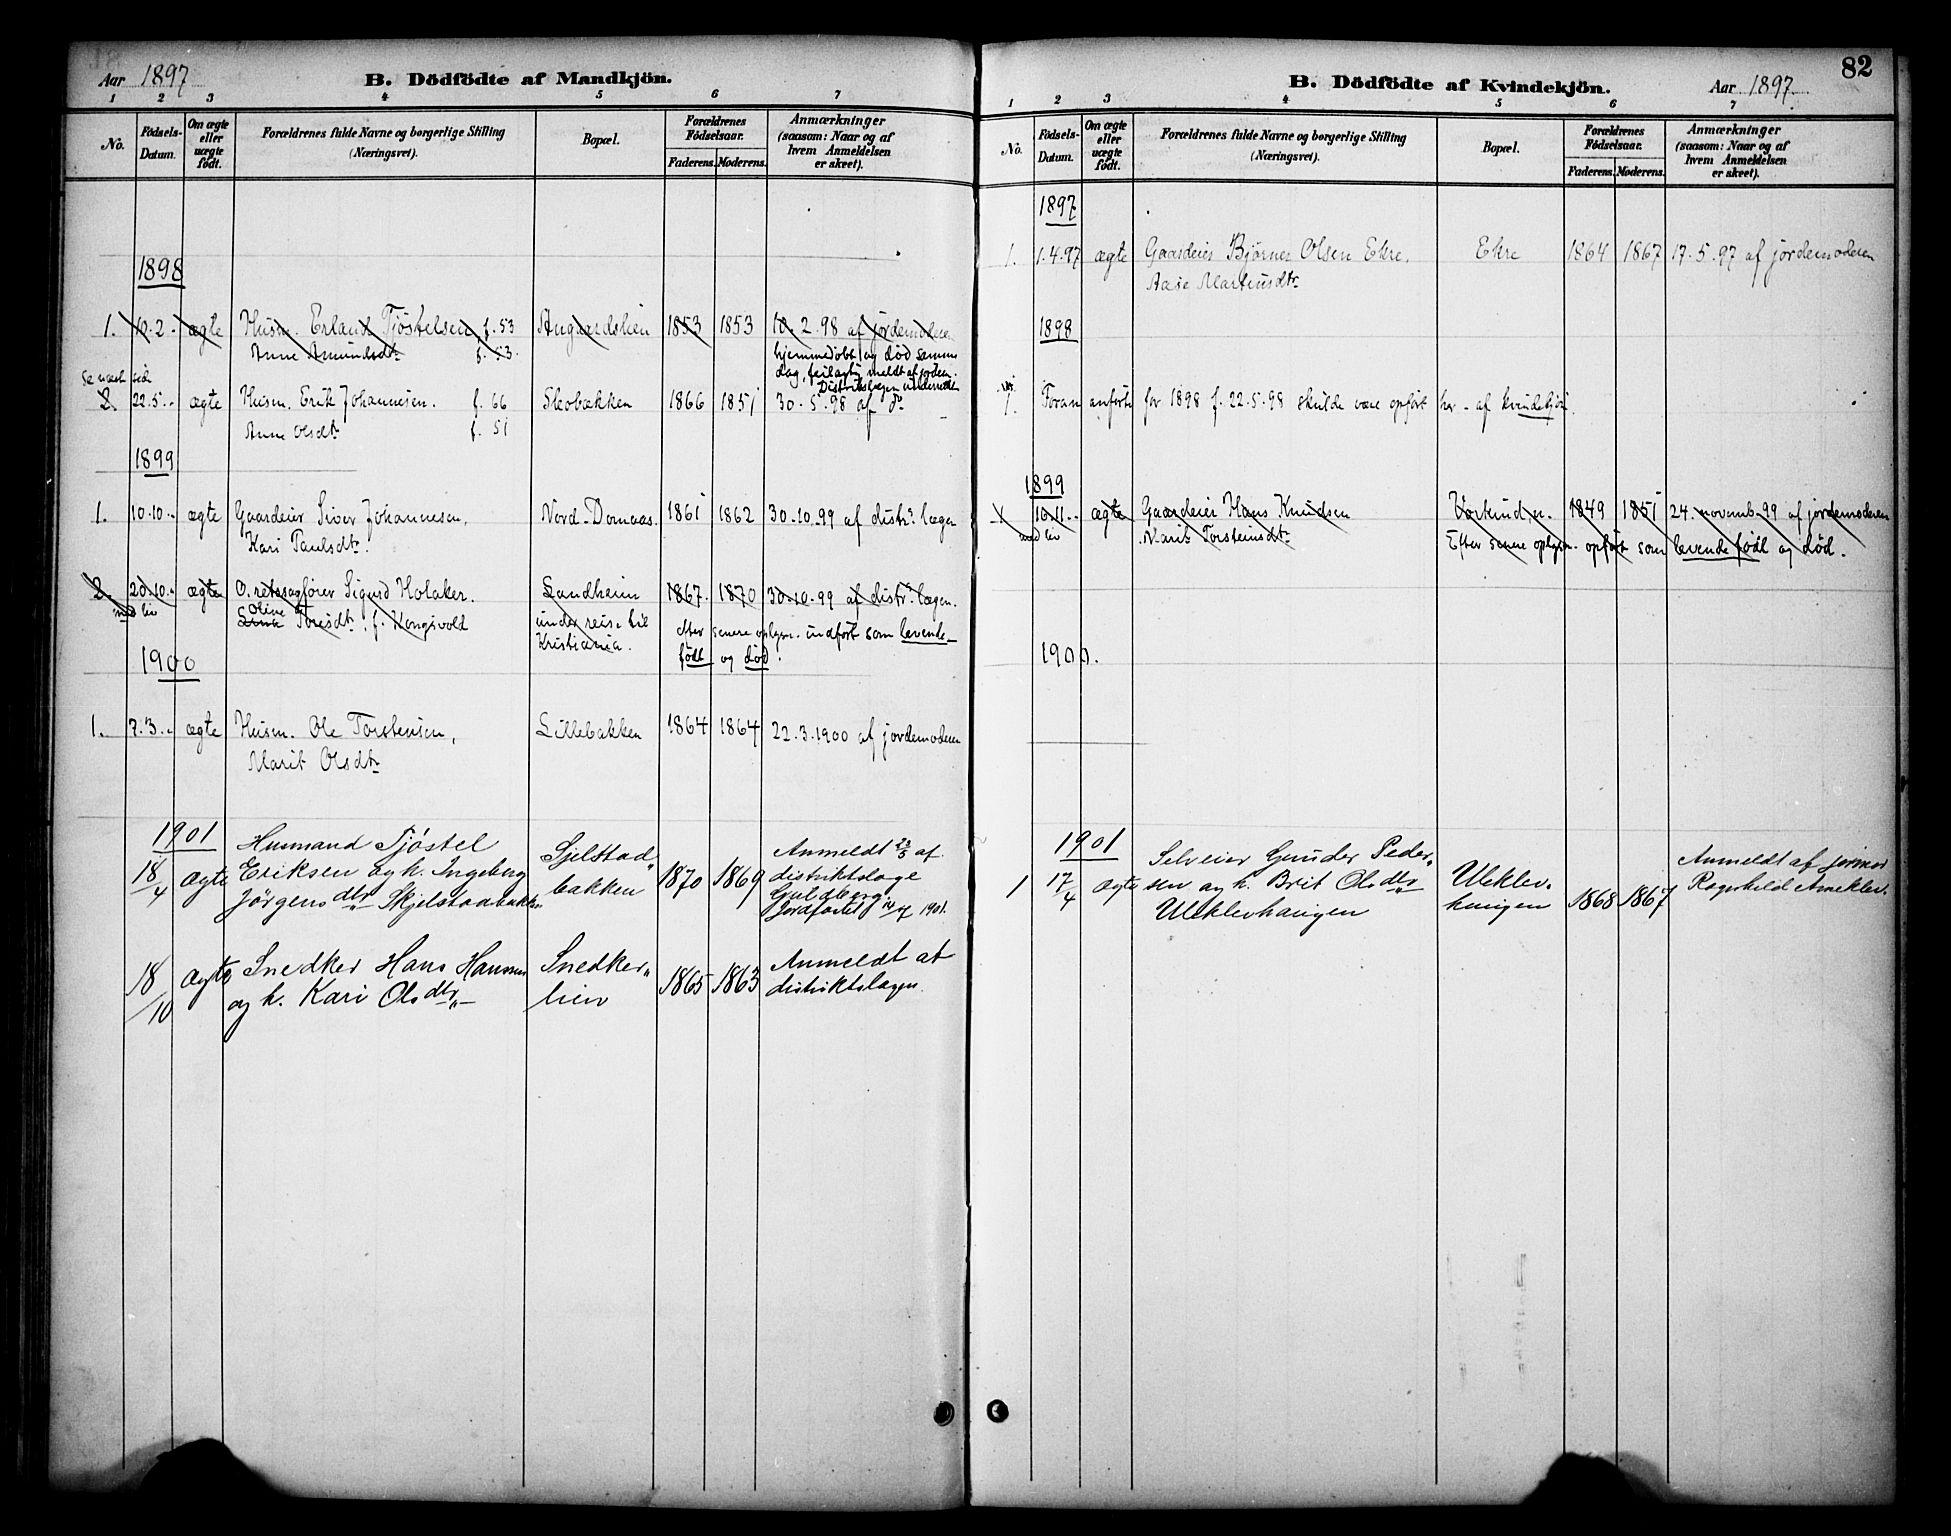 SAH, Dovre prestekontor, Ministerialbok nr. 3, 1891-1901, s. 82